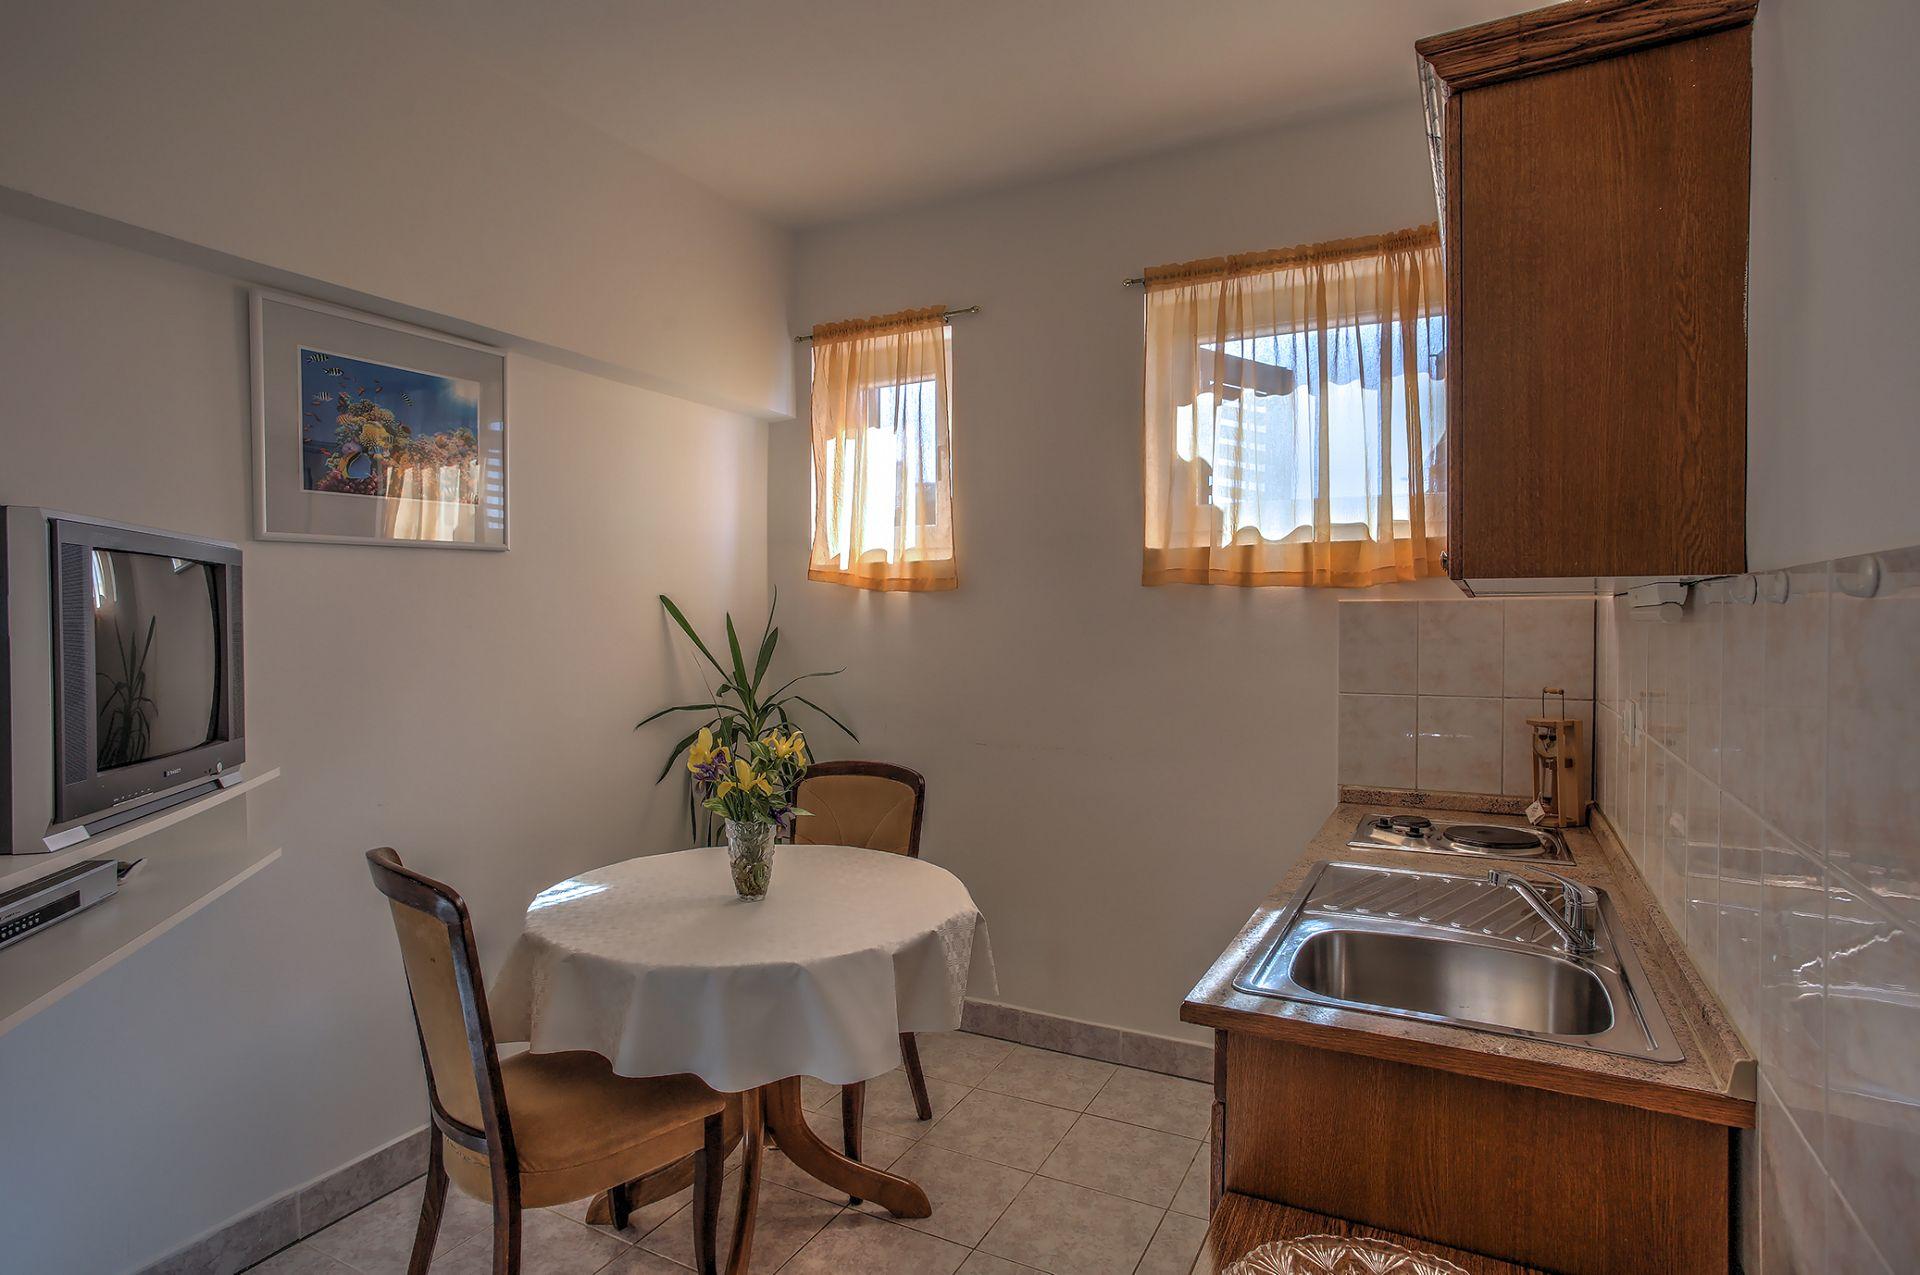 5409 - Jezera - Apartments Croatia - A2(2+1): kitchen and dining room